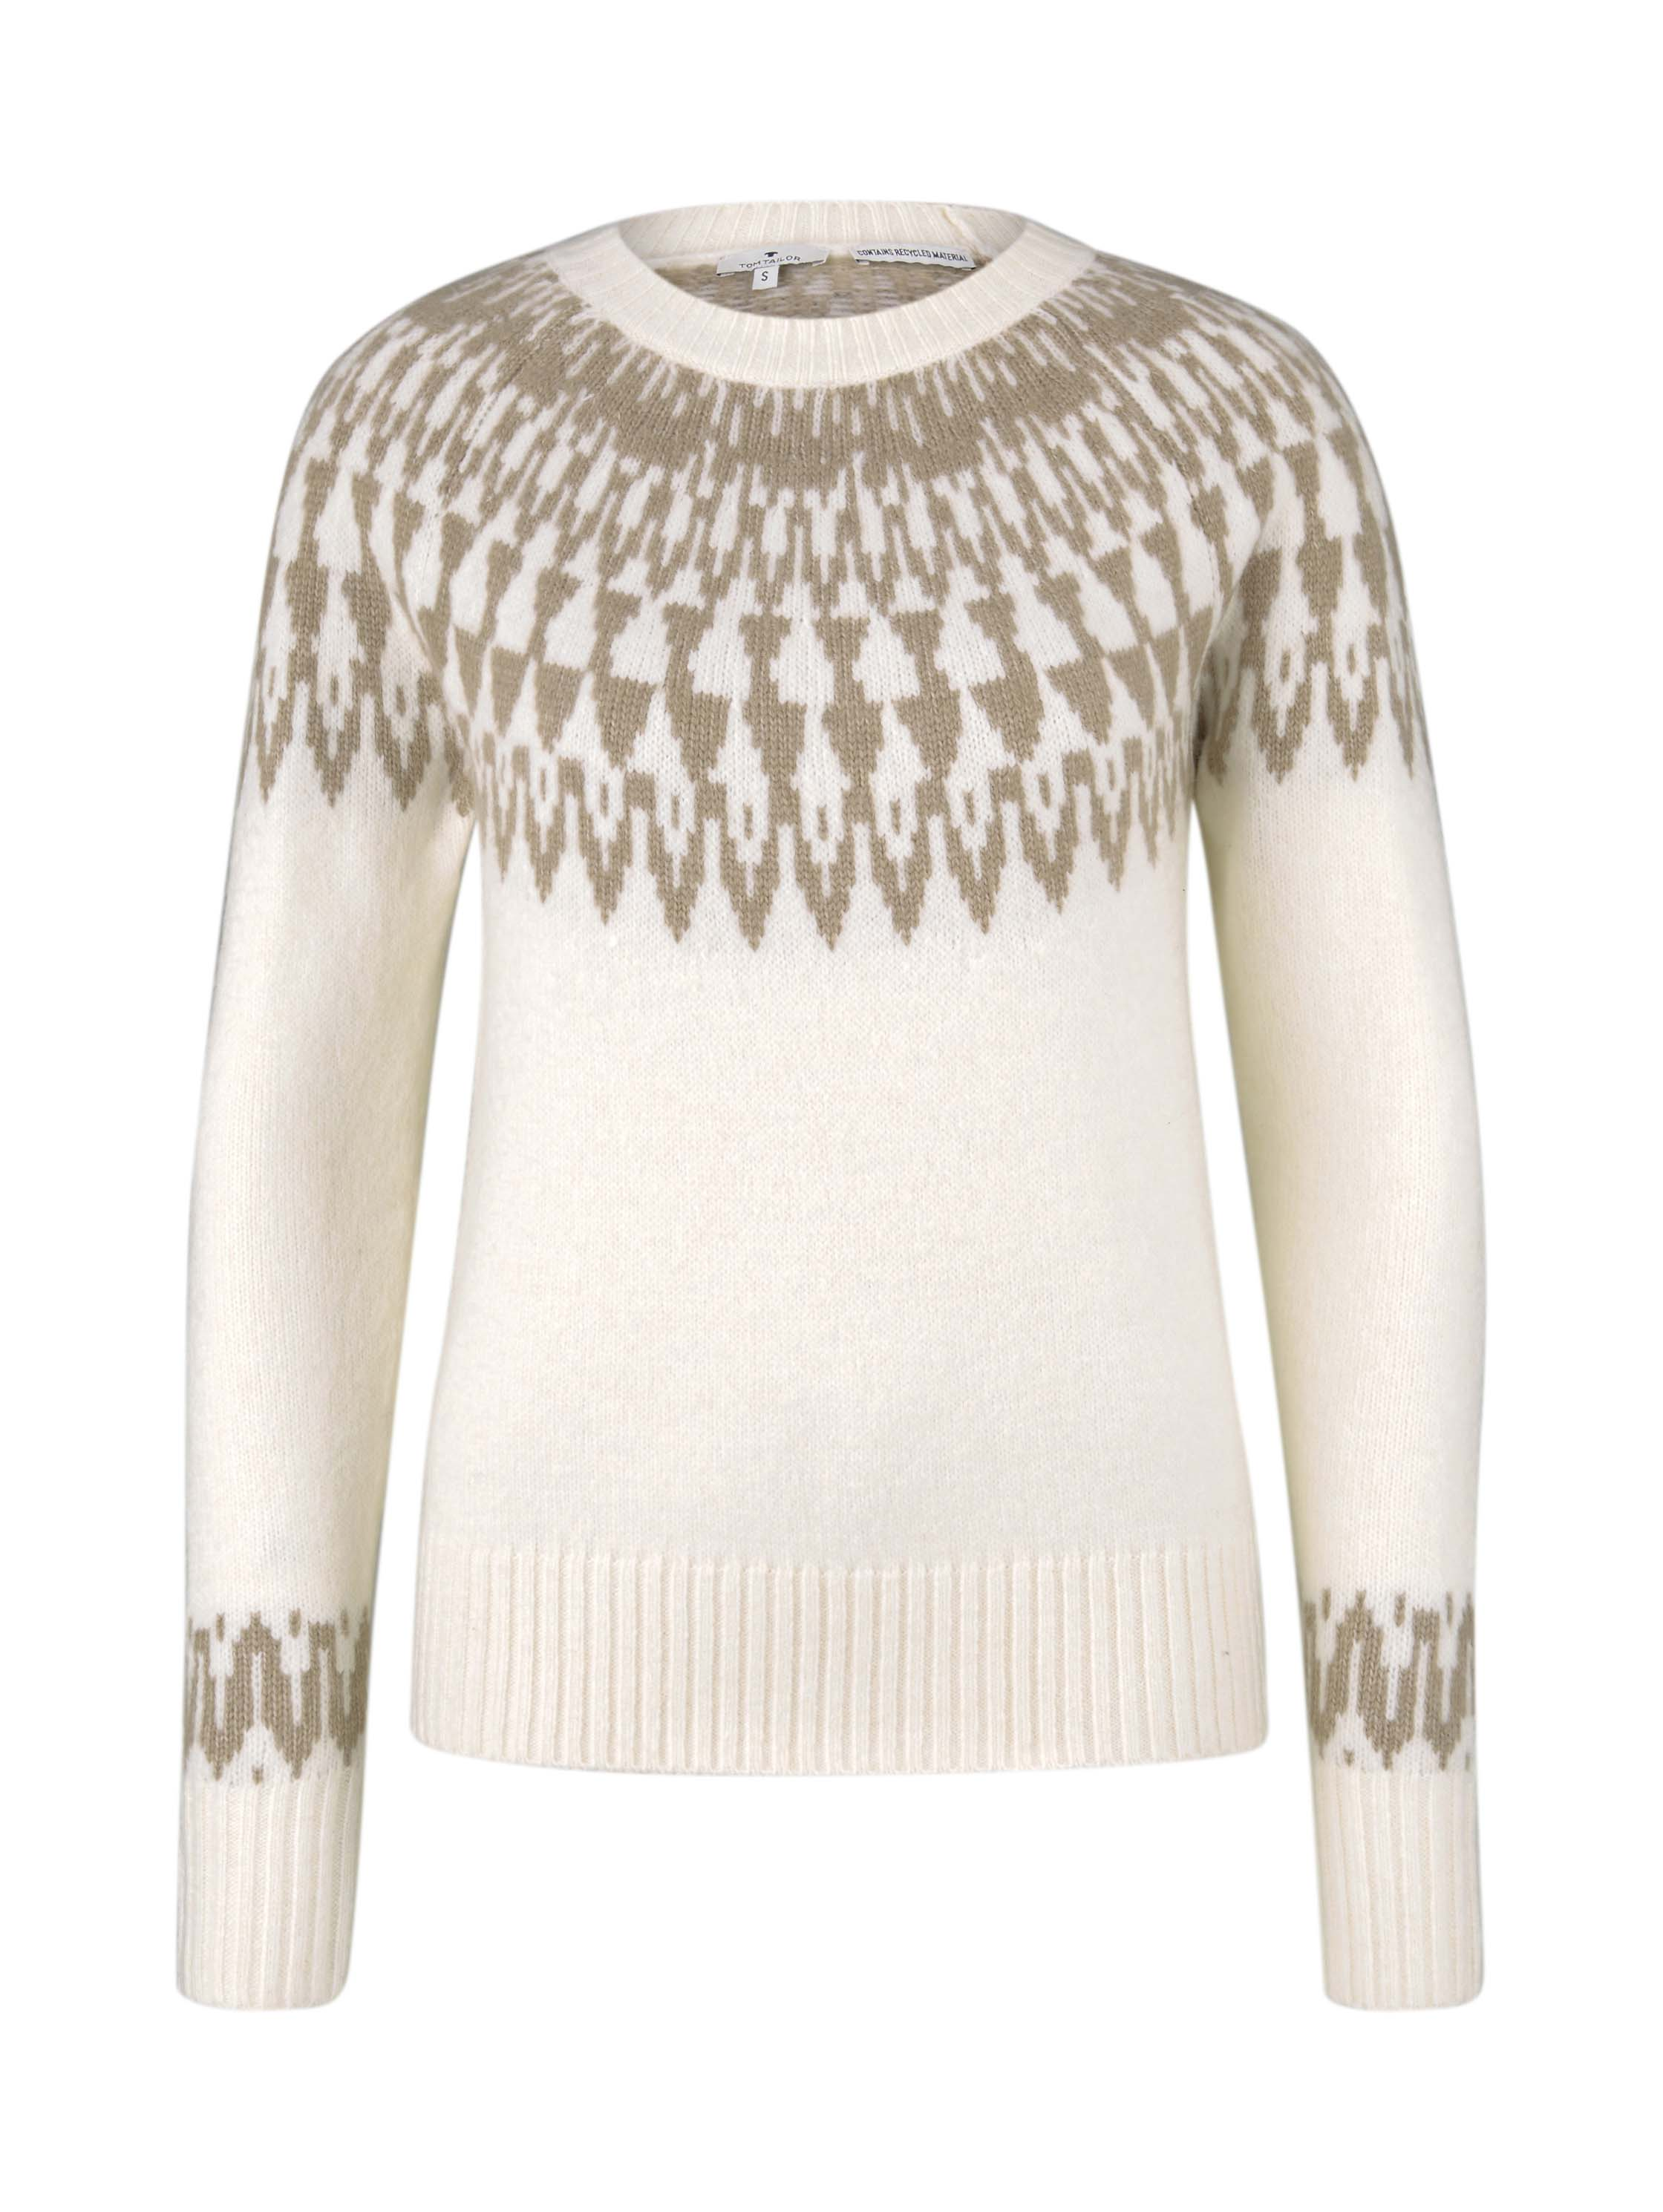 cozy fair isle pullover, soft powder beige